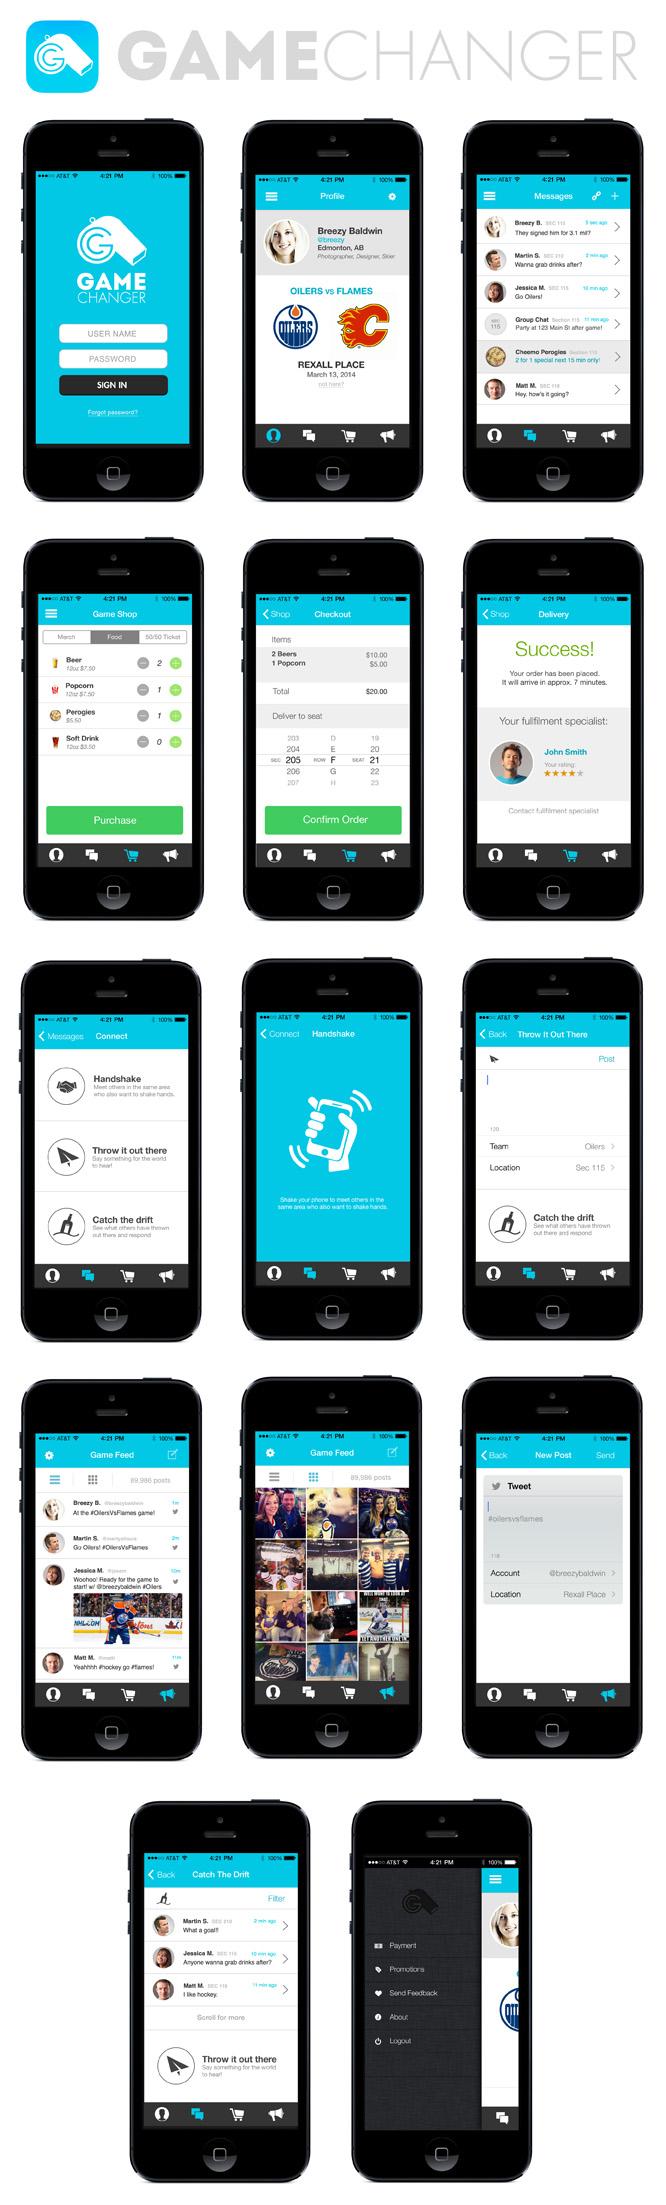 Game Changer App